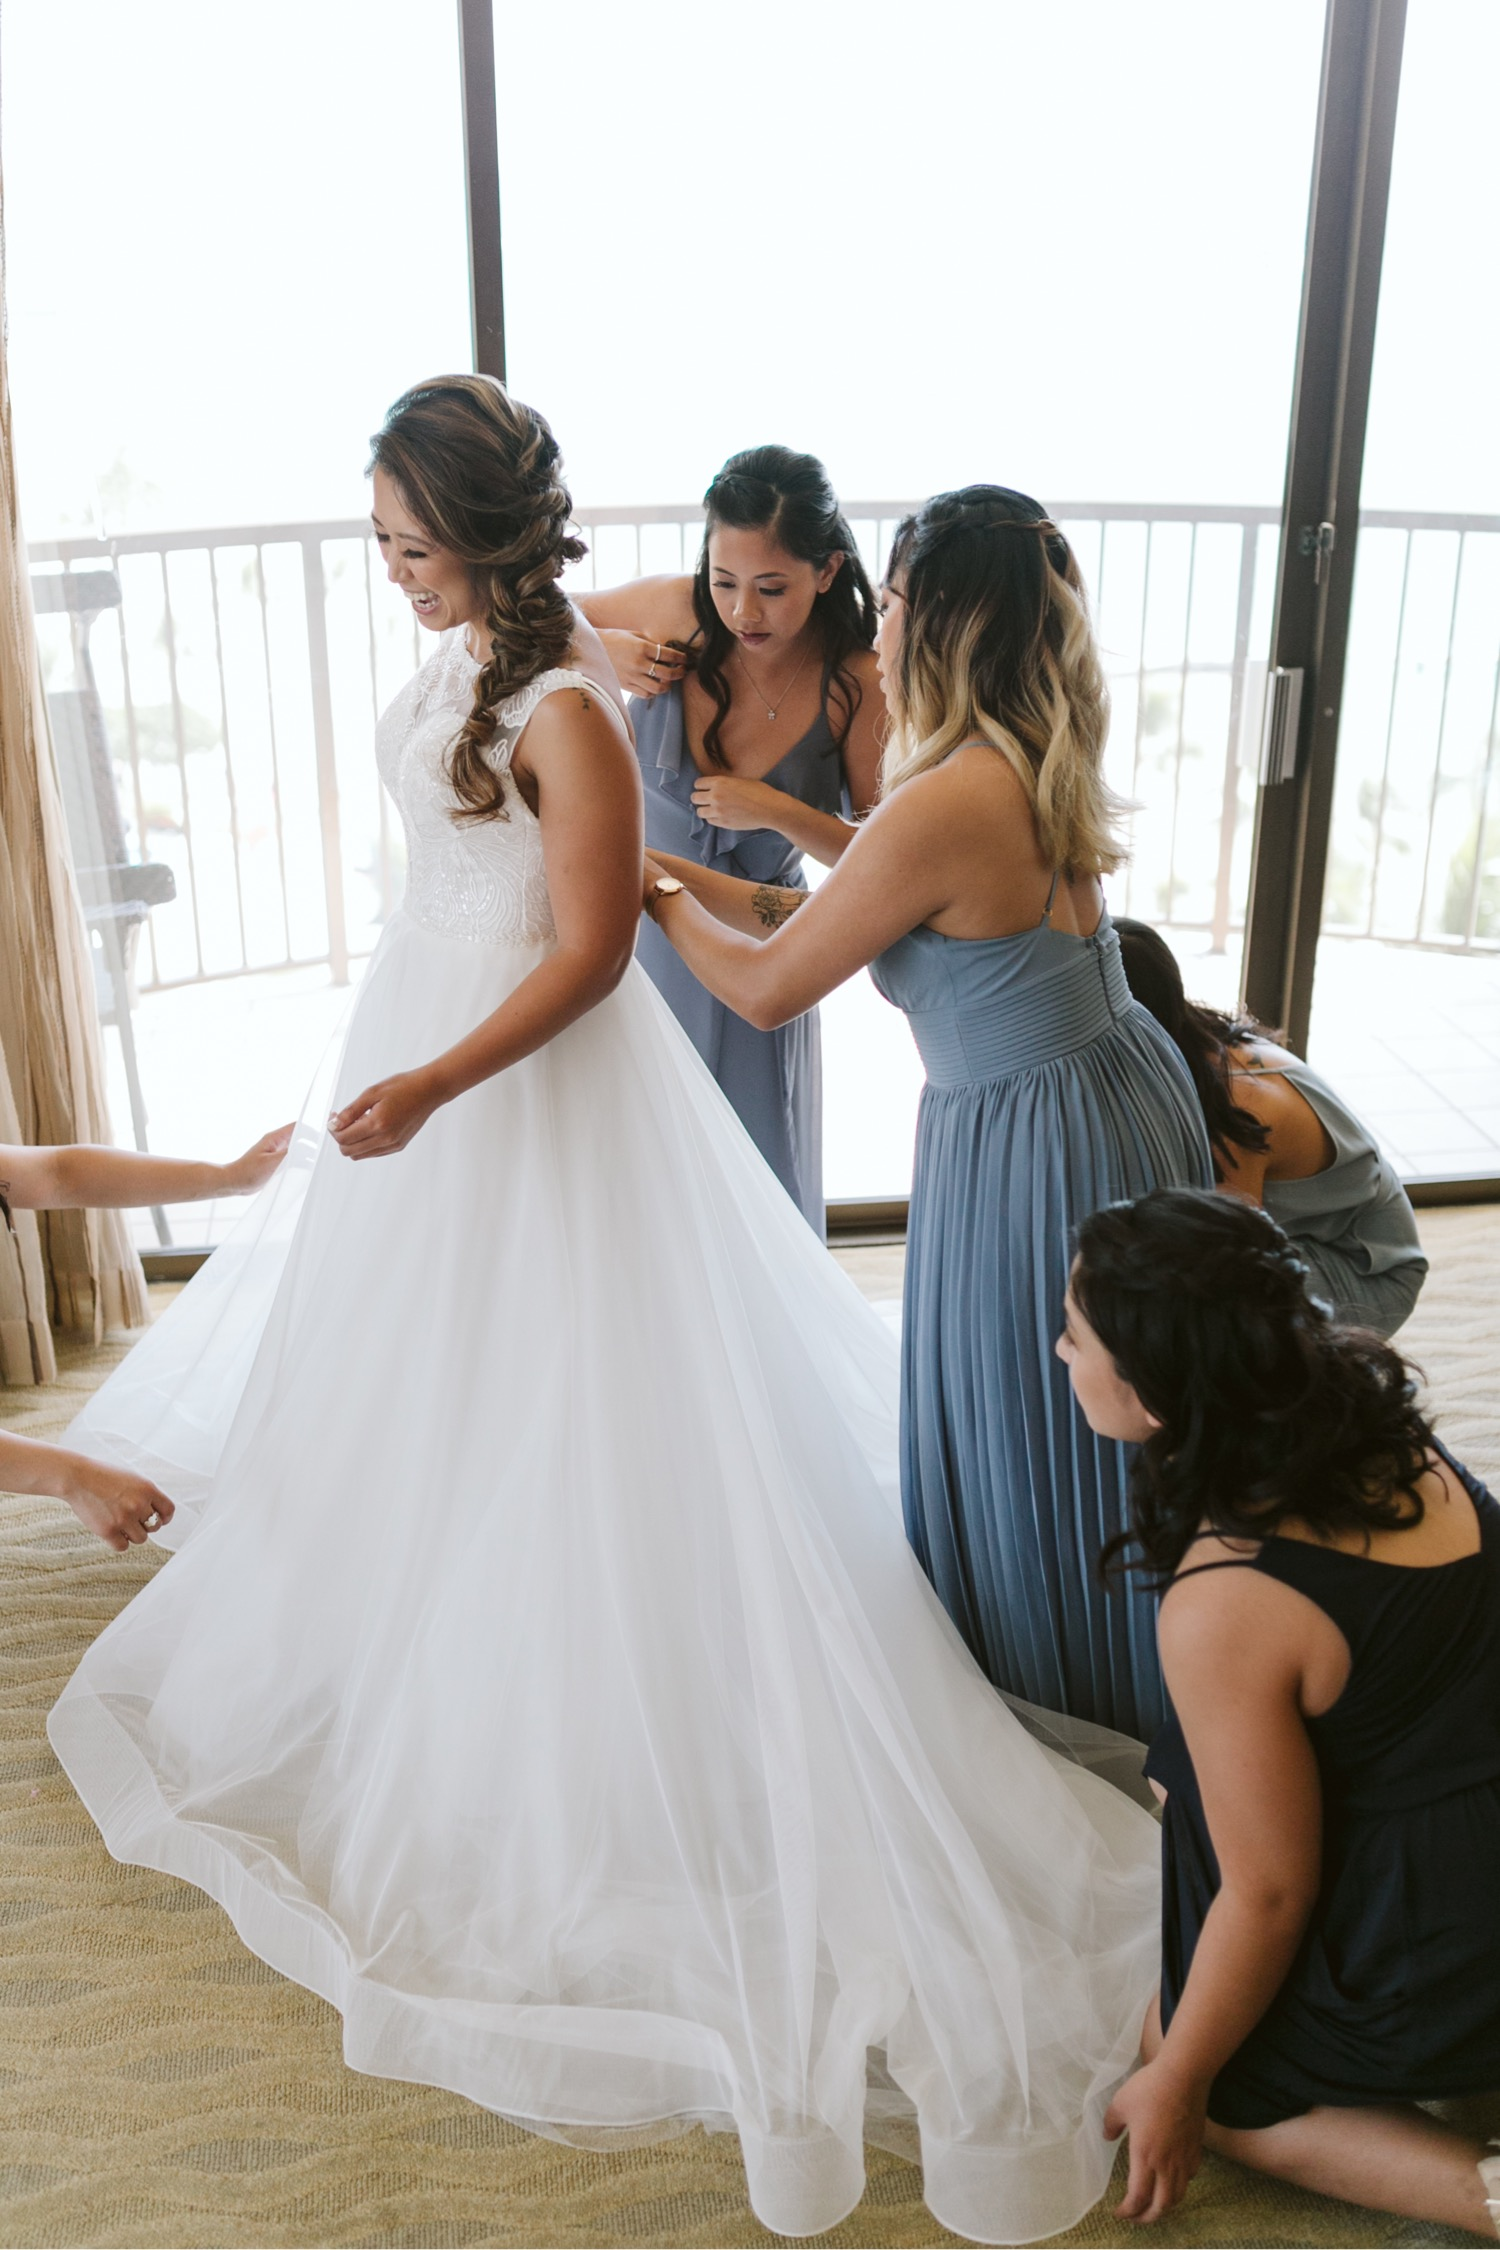 010_Brayden-Julianne-Wedding-10_Bridesmaids_Hawaiian_Village_Bride_getting_ready_Hilton.jpg